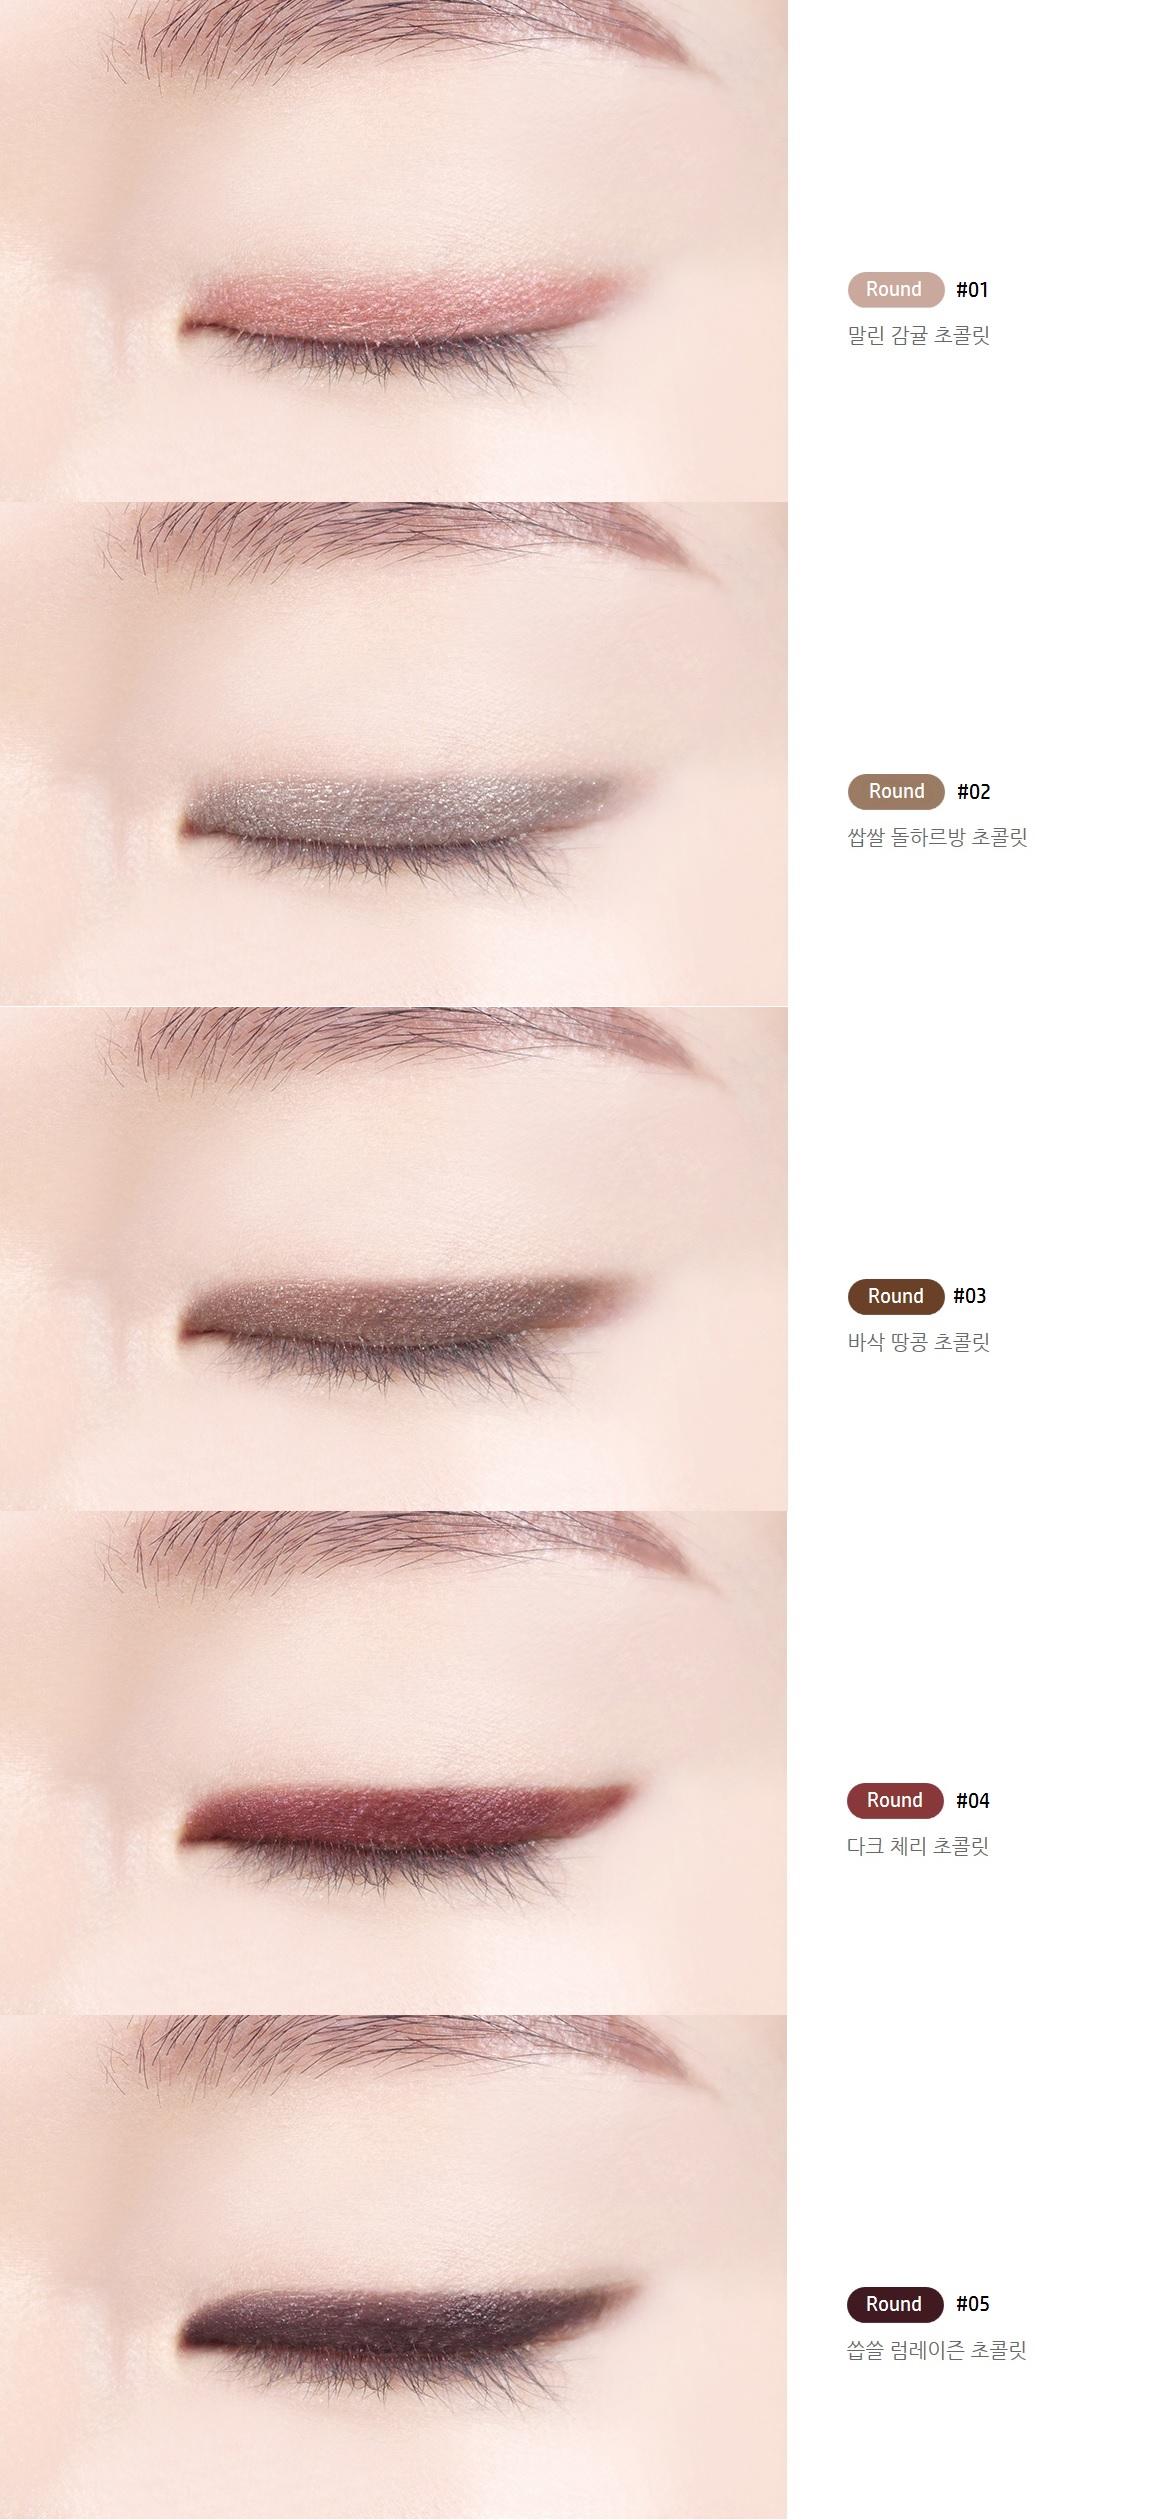 INNISFREE Eye Contouring Stick Round 0.7g / Edge 2.3g